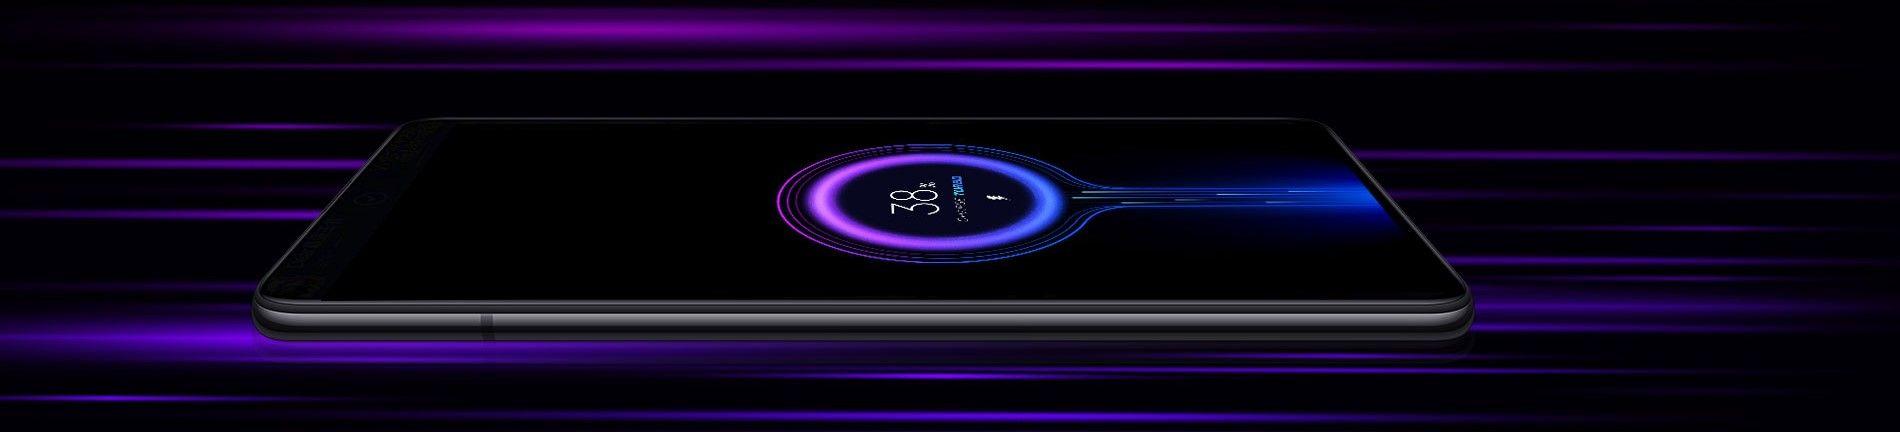 Xiaomi Mi 9T Pro аккумулятор смартфона